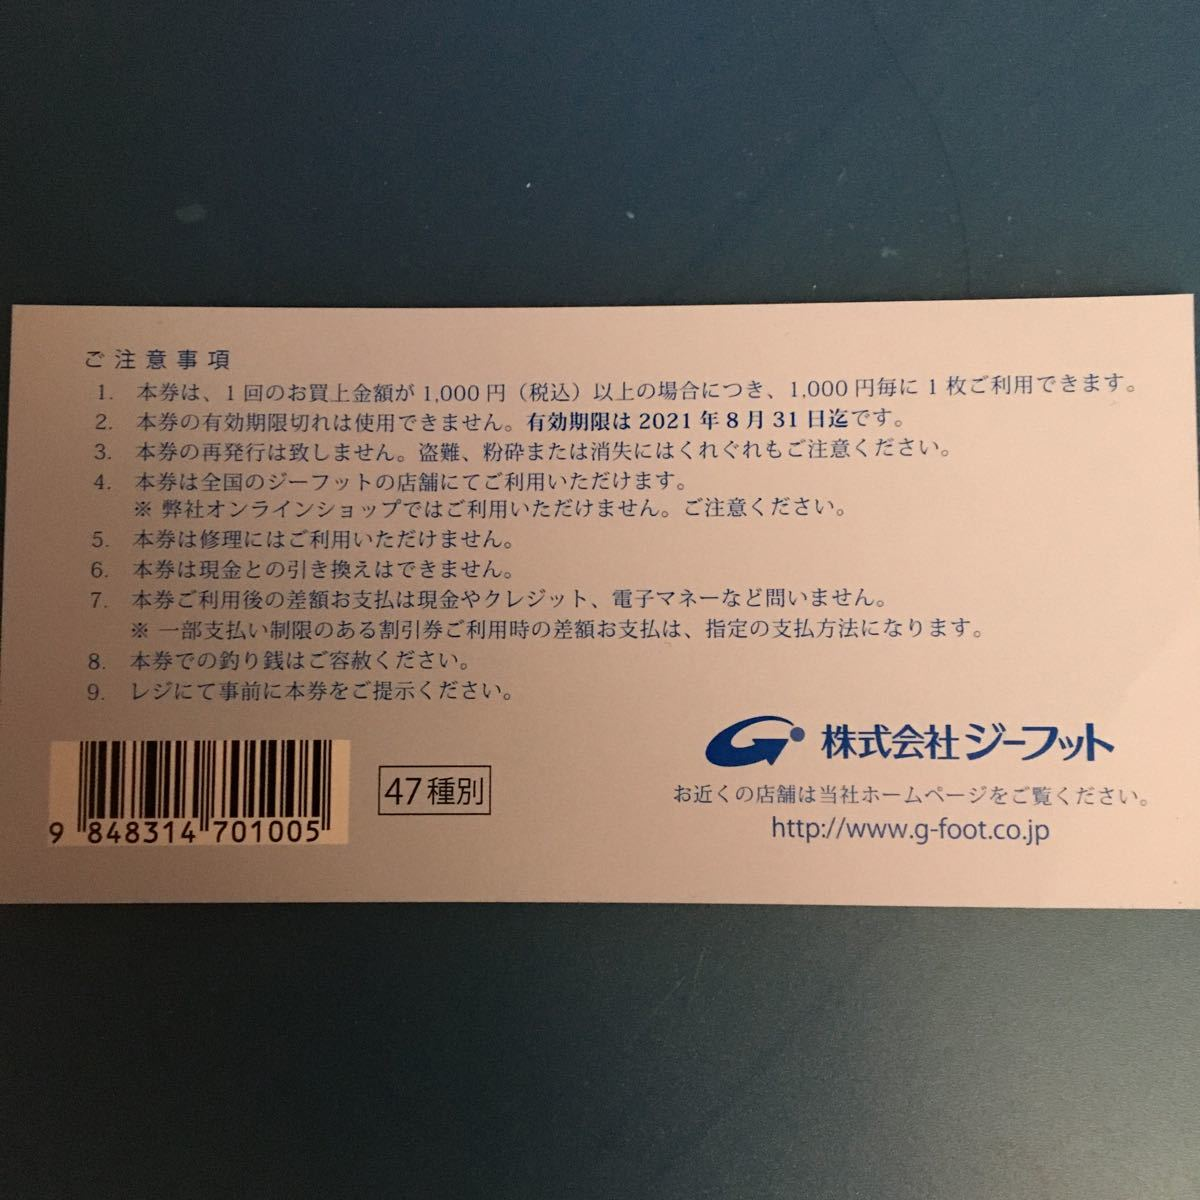 即日発送★送料込★ジーフット ASBee 株主優待券2000円(1000円2枚) 期限2021年8月31日_画像2